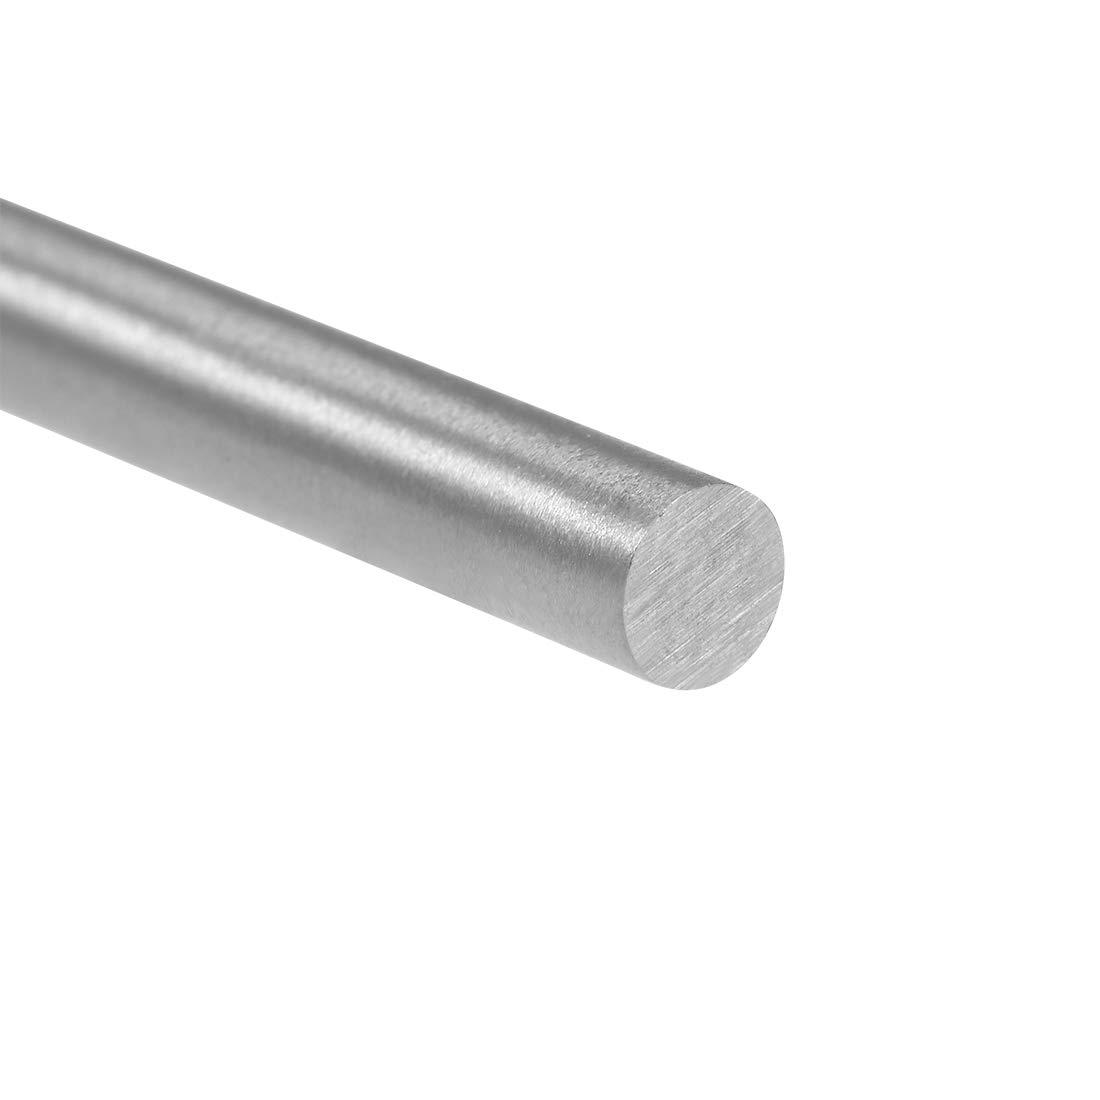 uxcell Round Rod 7.5mm Diameter 100mm Length HSS Lathe Bar Stock for Shaft Miniature Axle DIY Craft Tool 10 Pcs